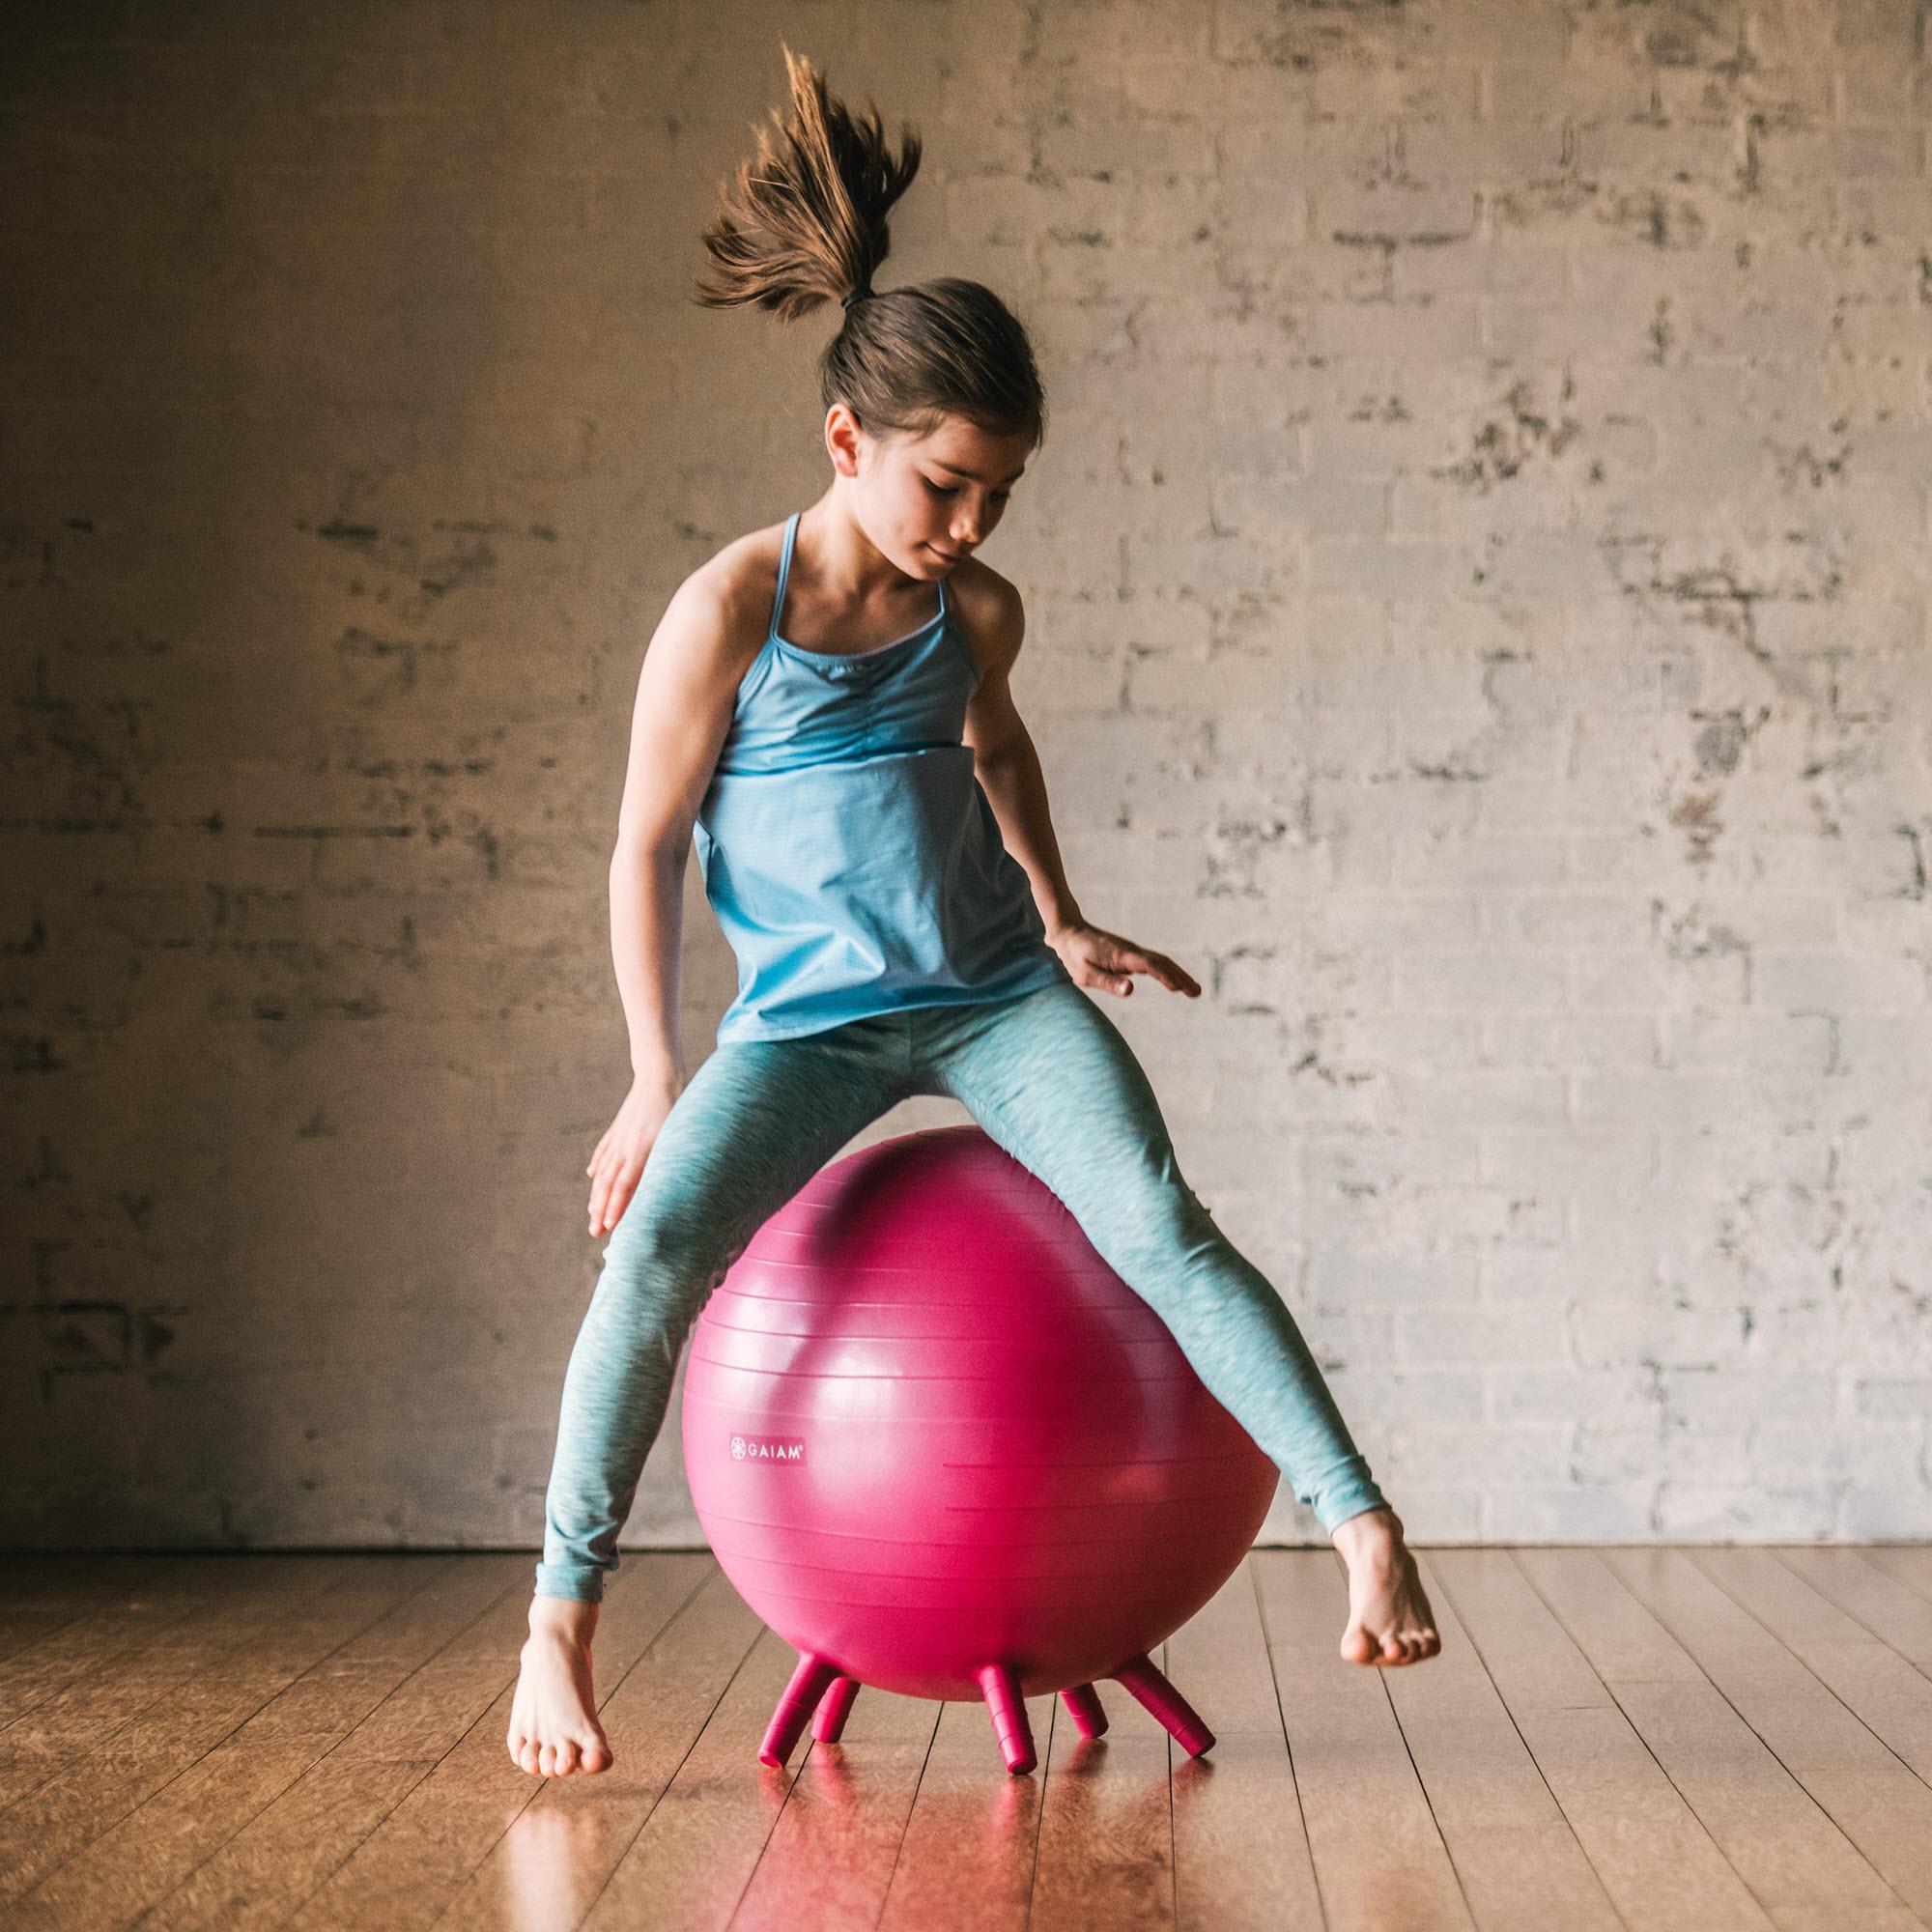 Balance Ball Legs: Amazon.com : Gaiam Kids Stay-N-Play Balance Ball, Grey